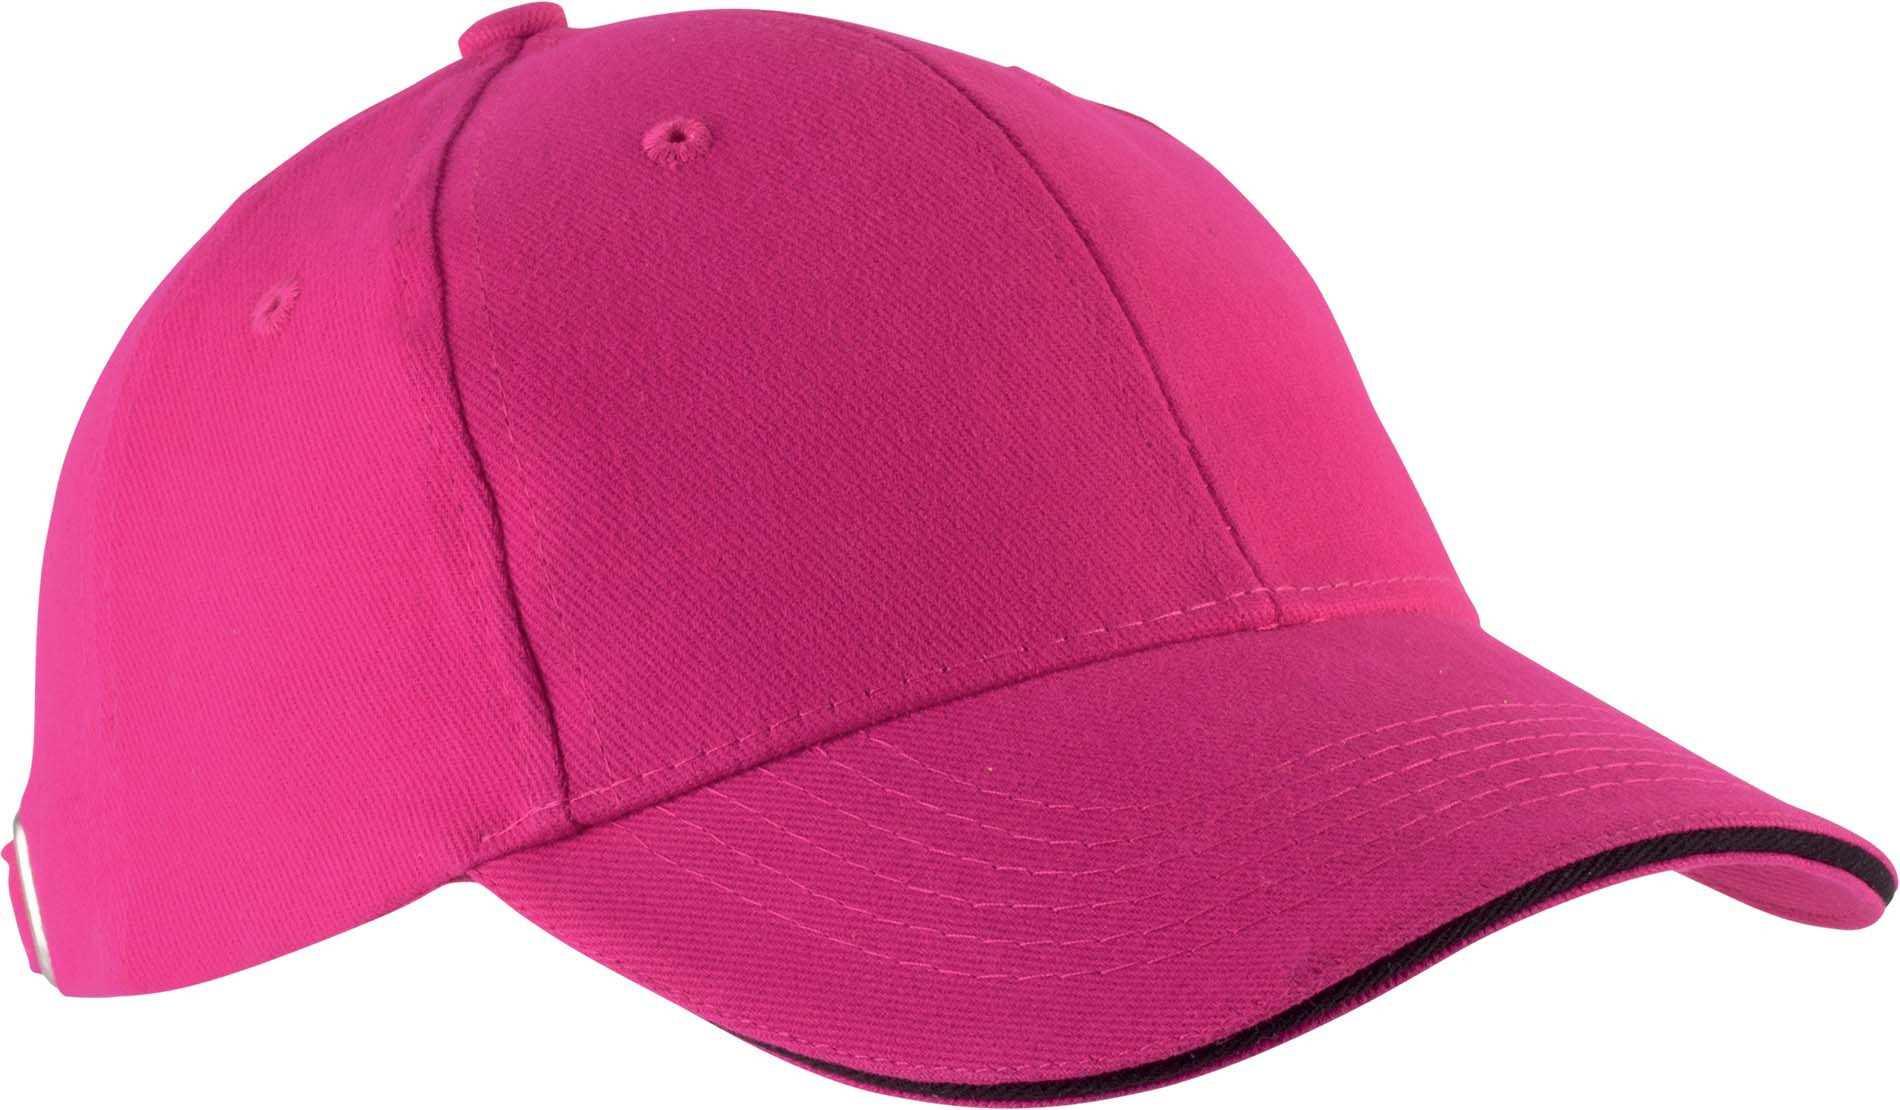 casquette femme rose